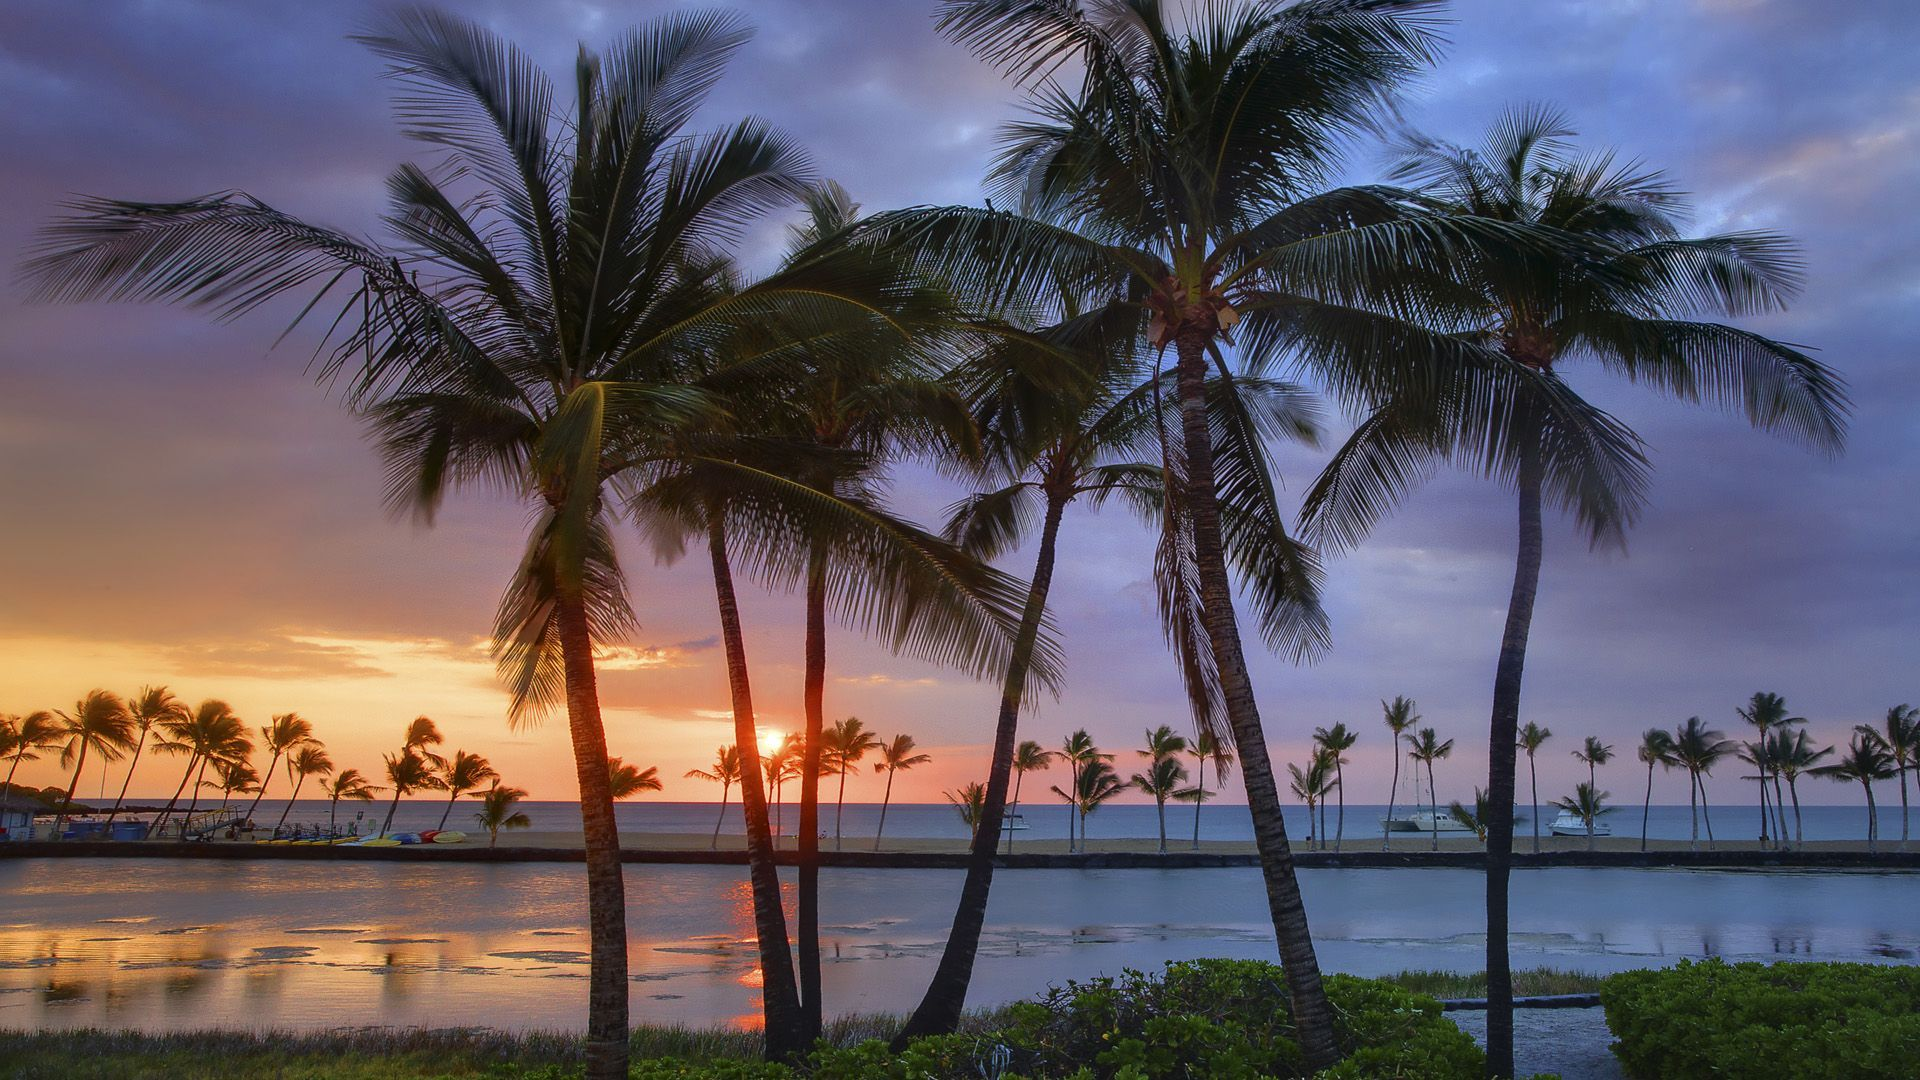 Hawaiian sunset wallpaper - 315108